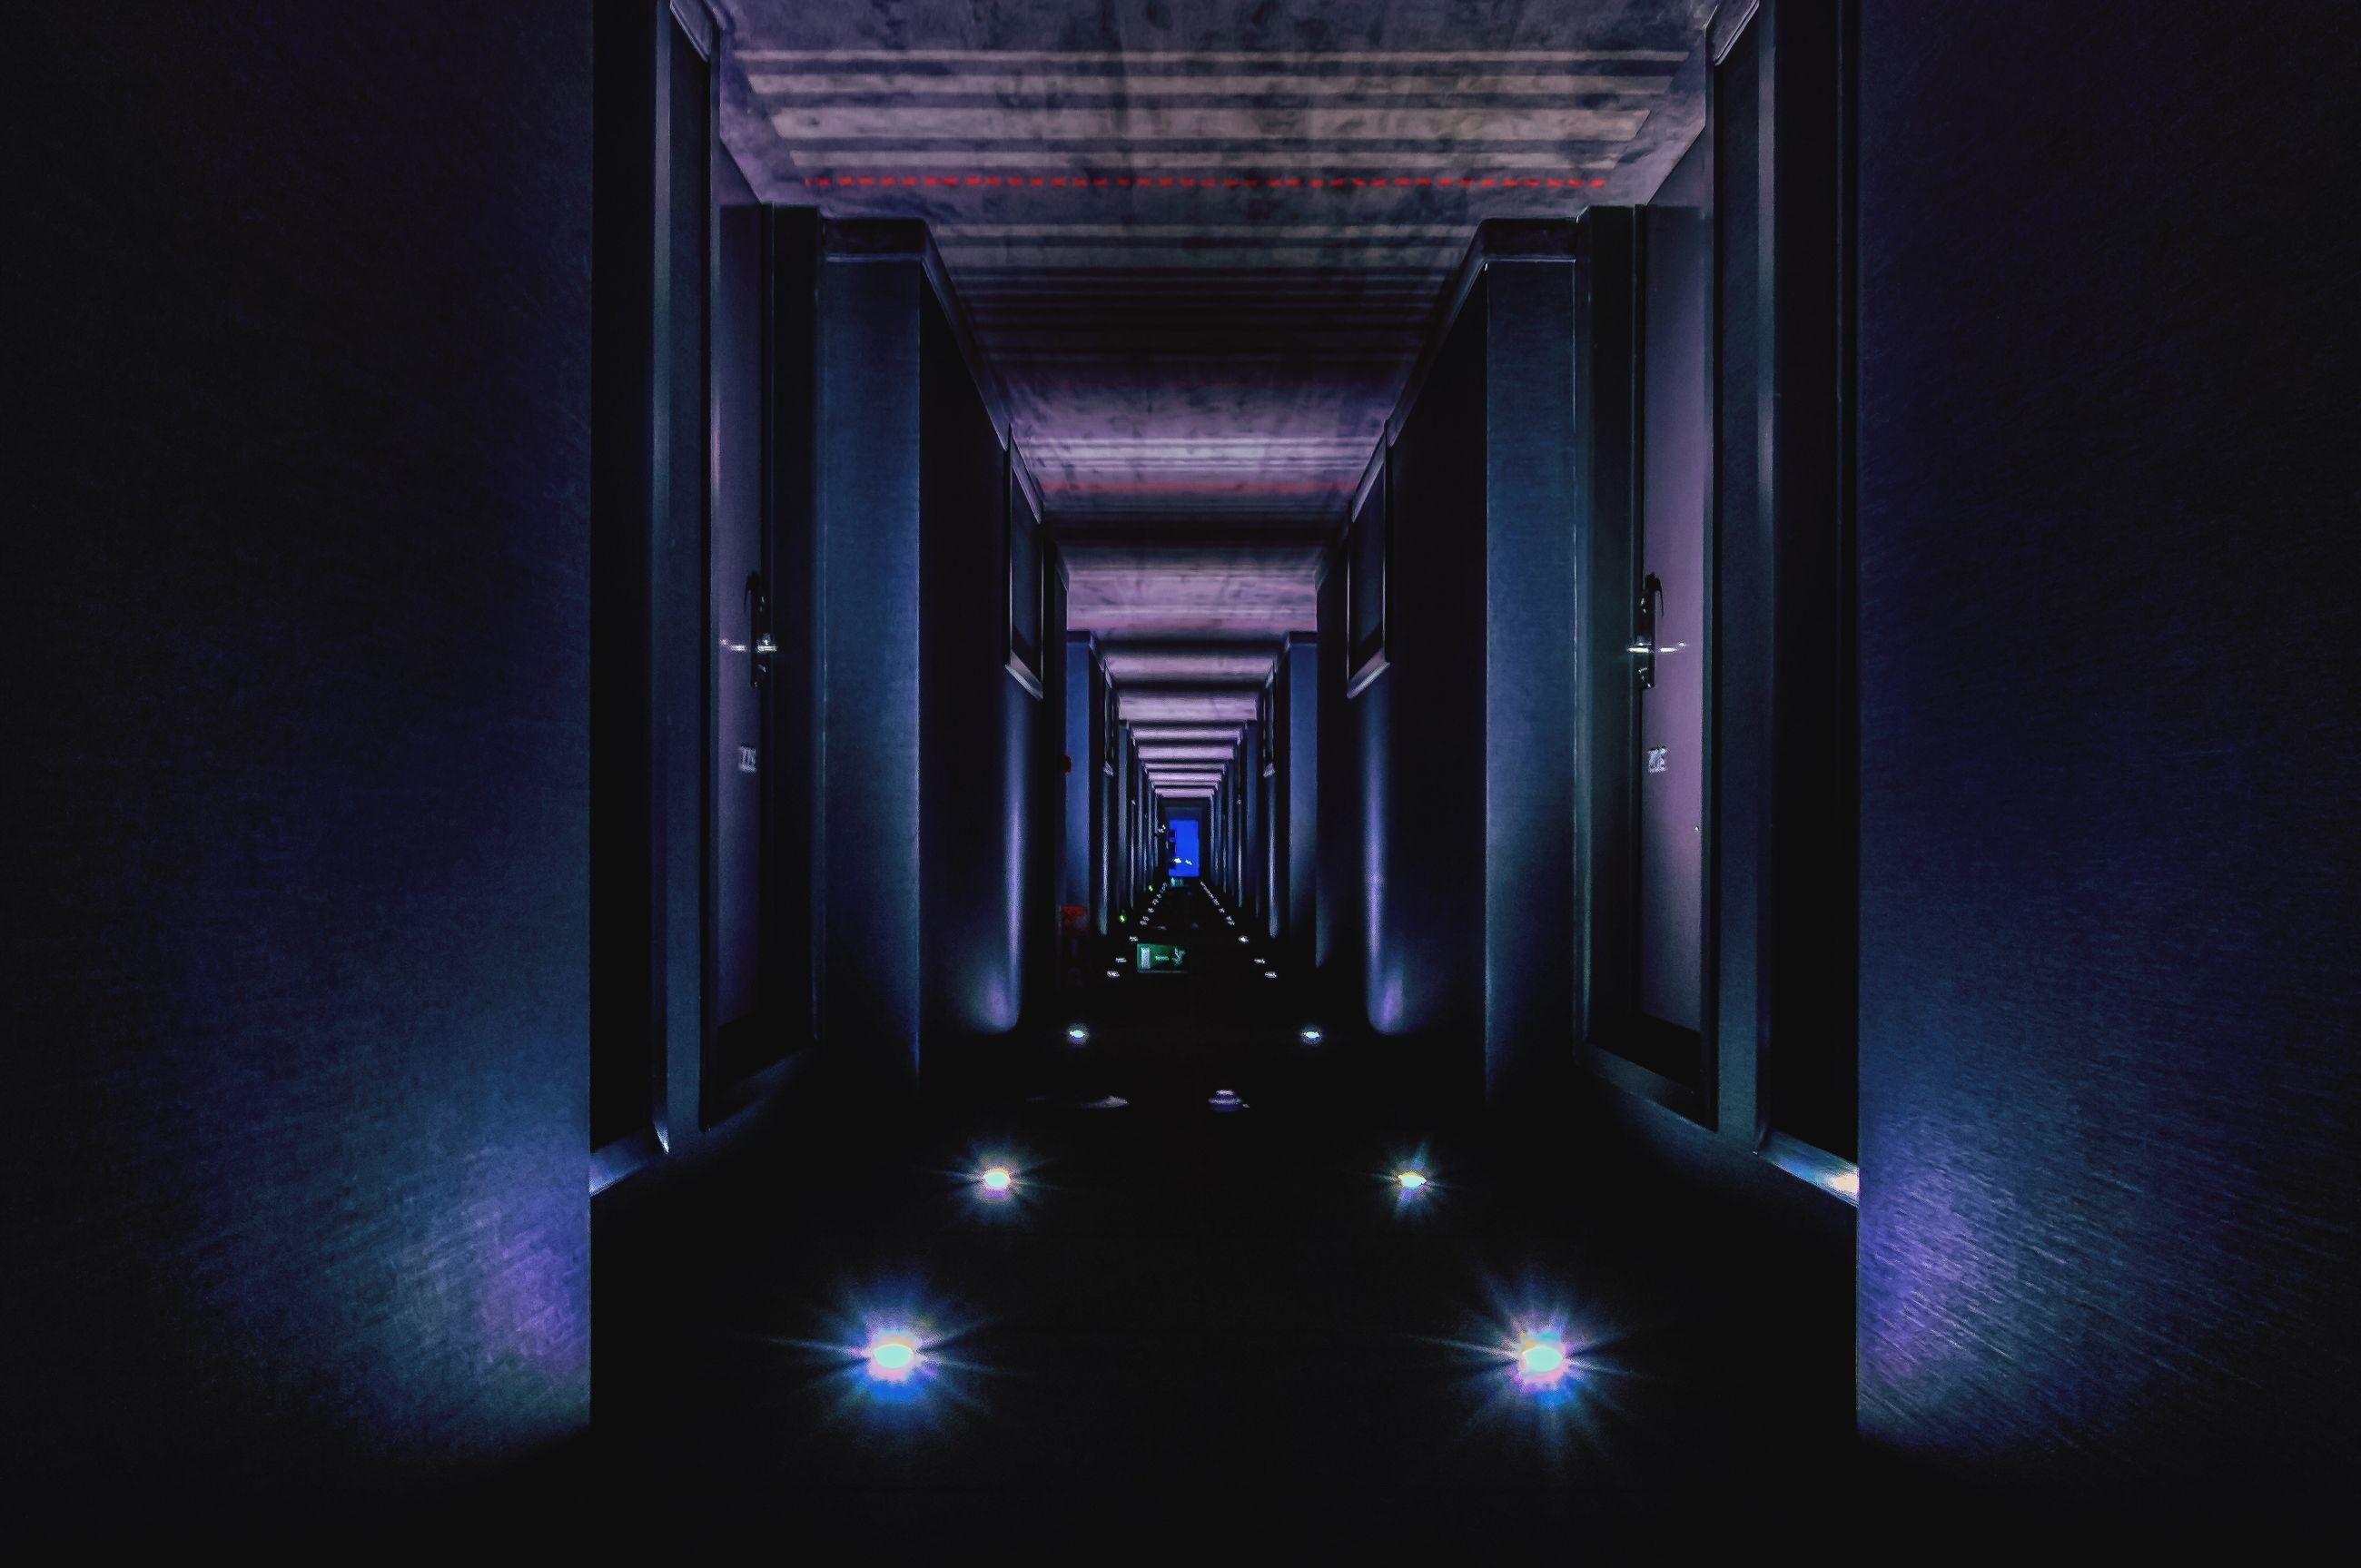 Upside down image of illuminated hotel passage